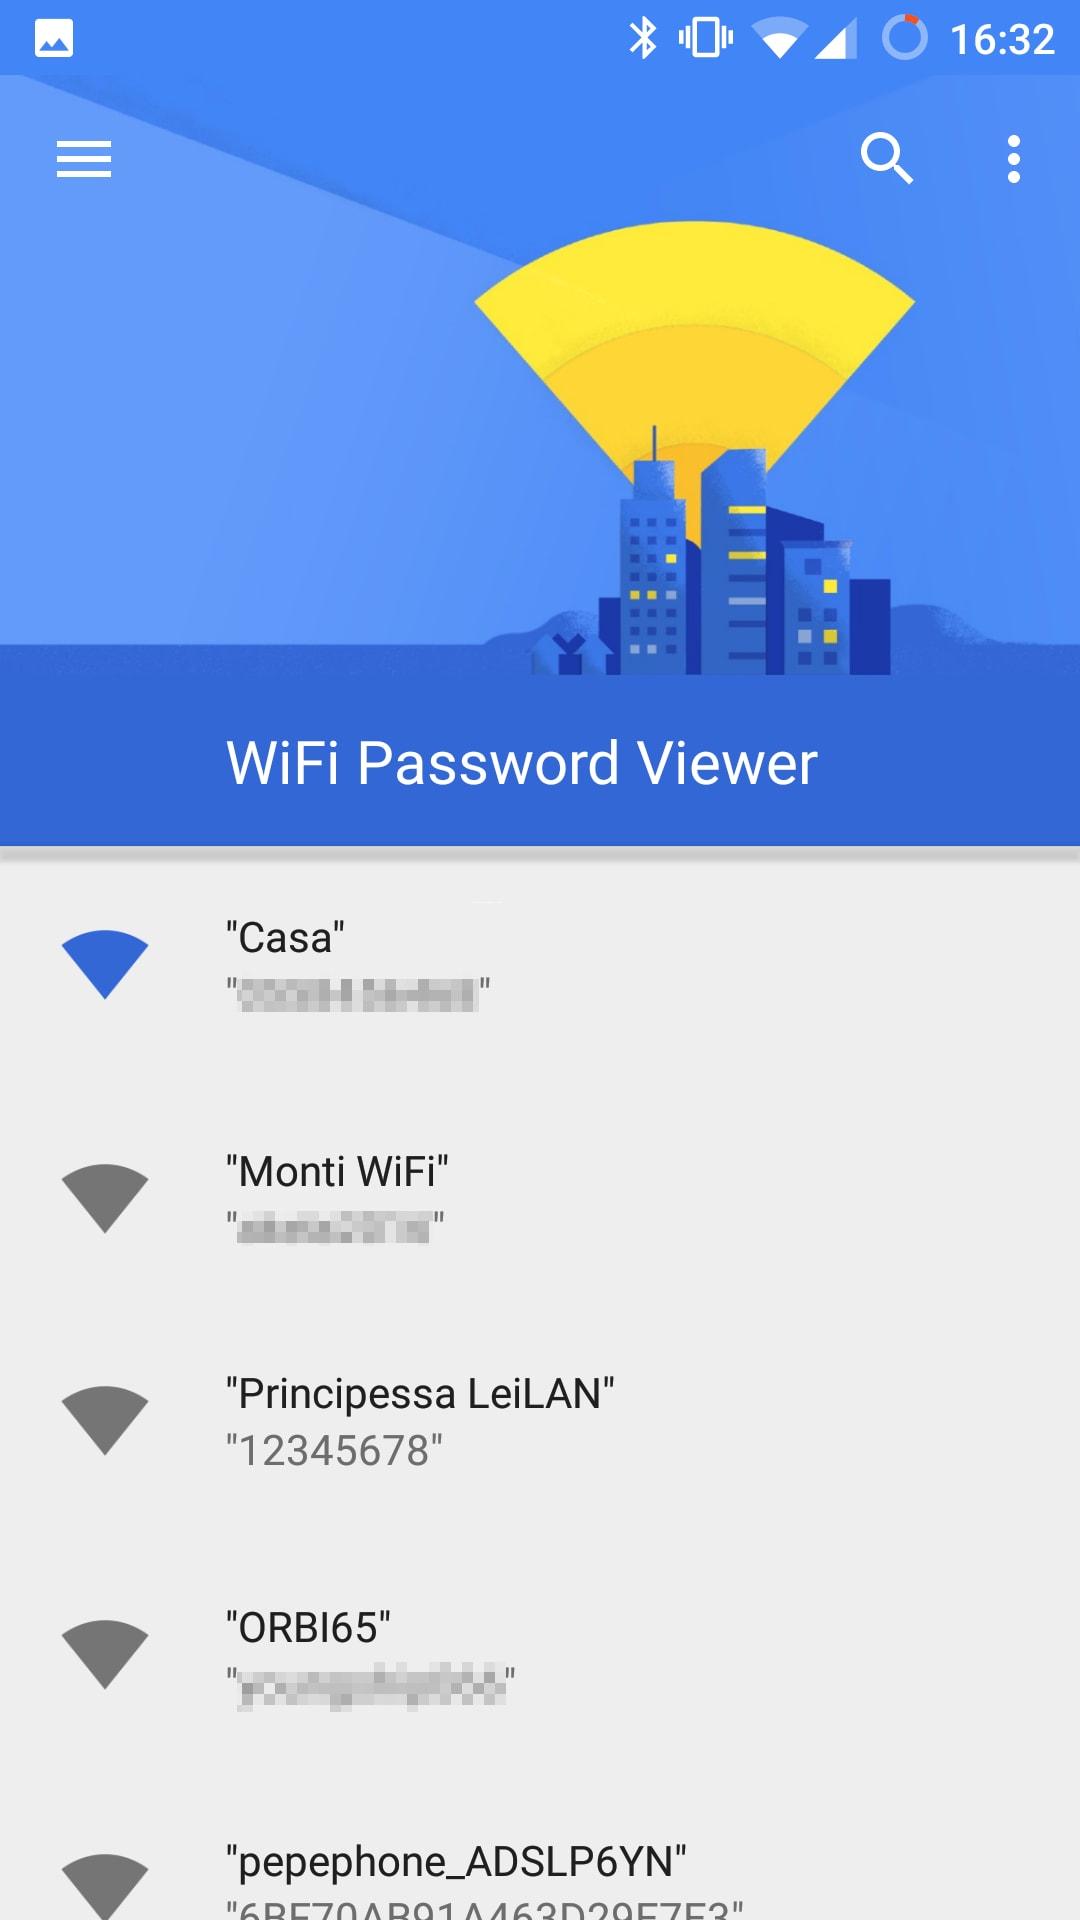 WiFi Password Viewer (1)